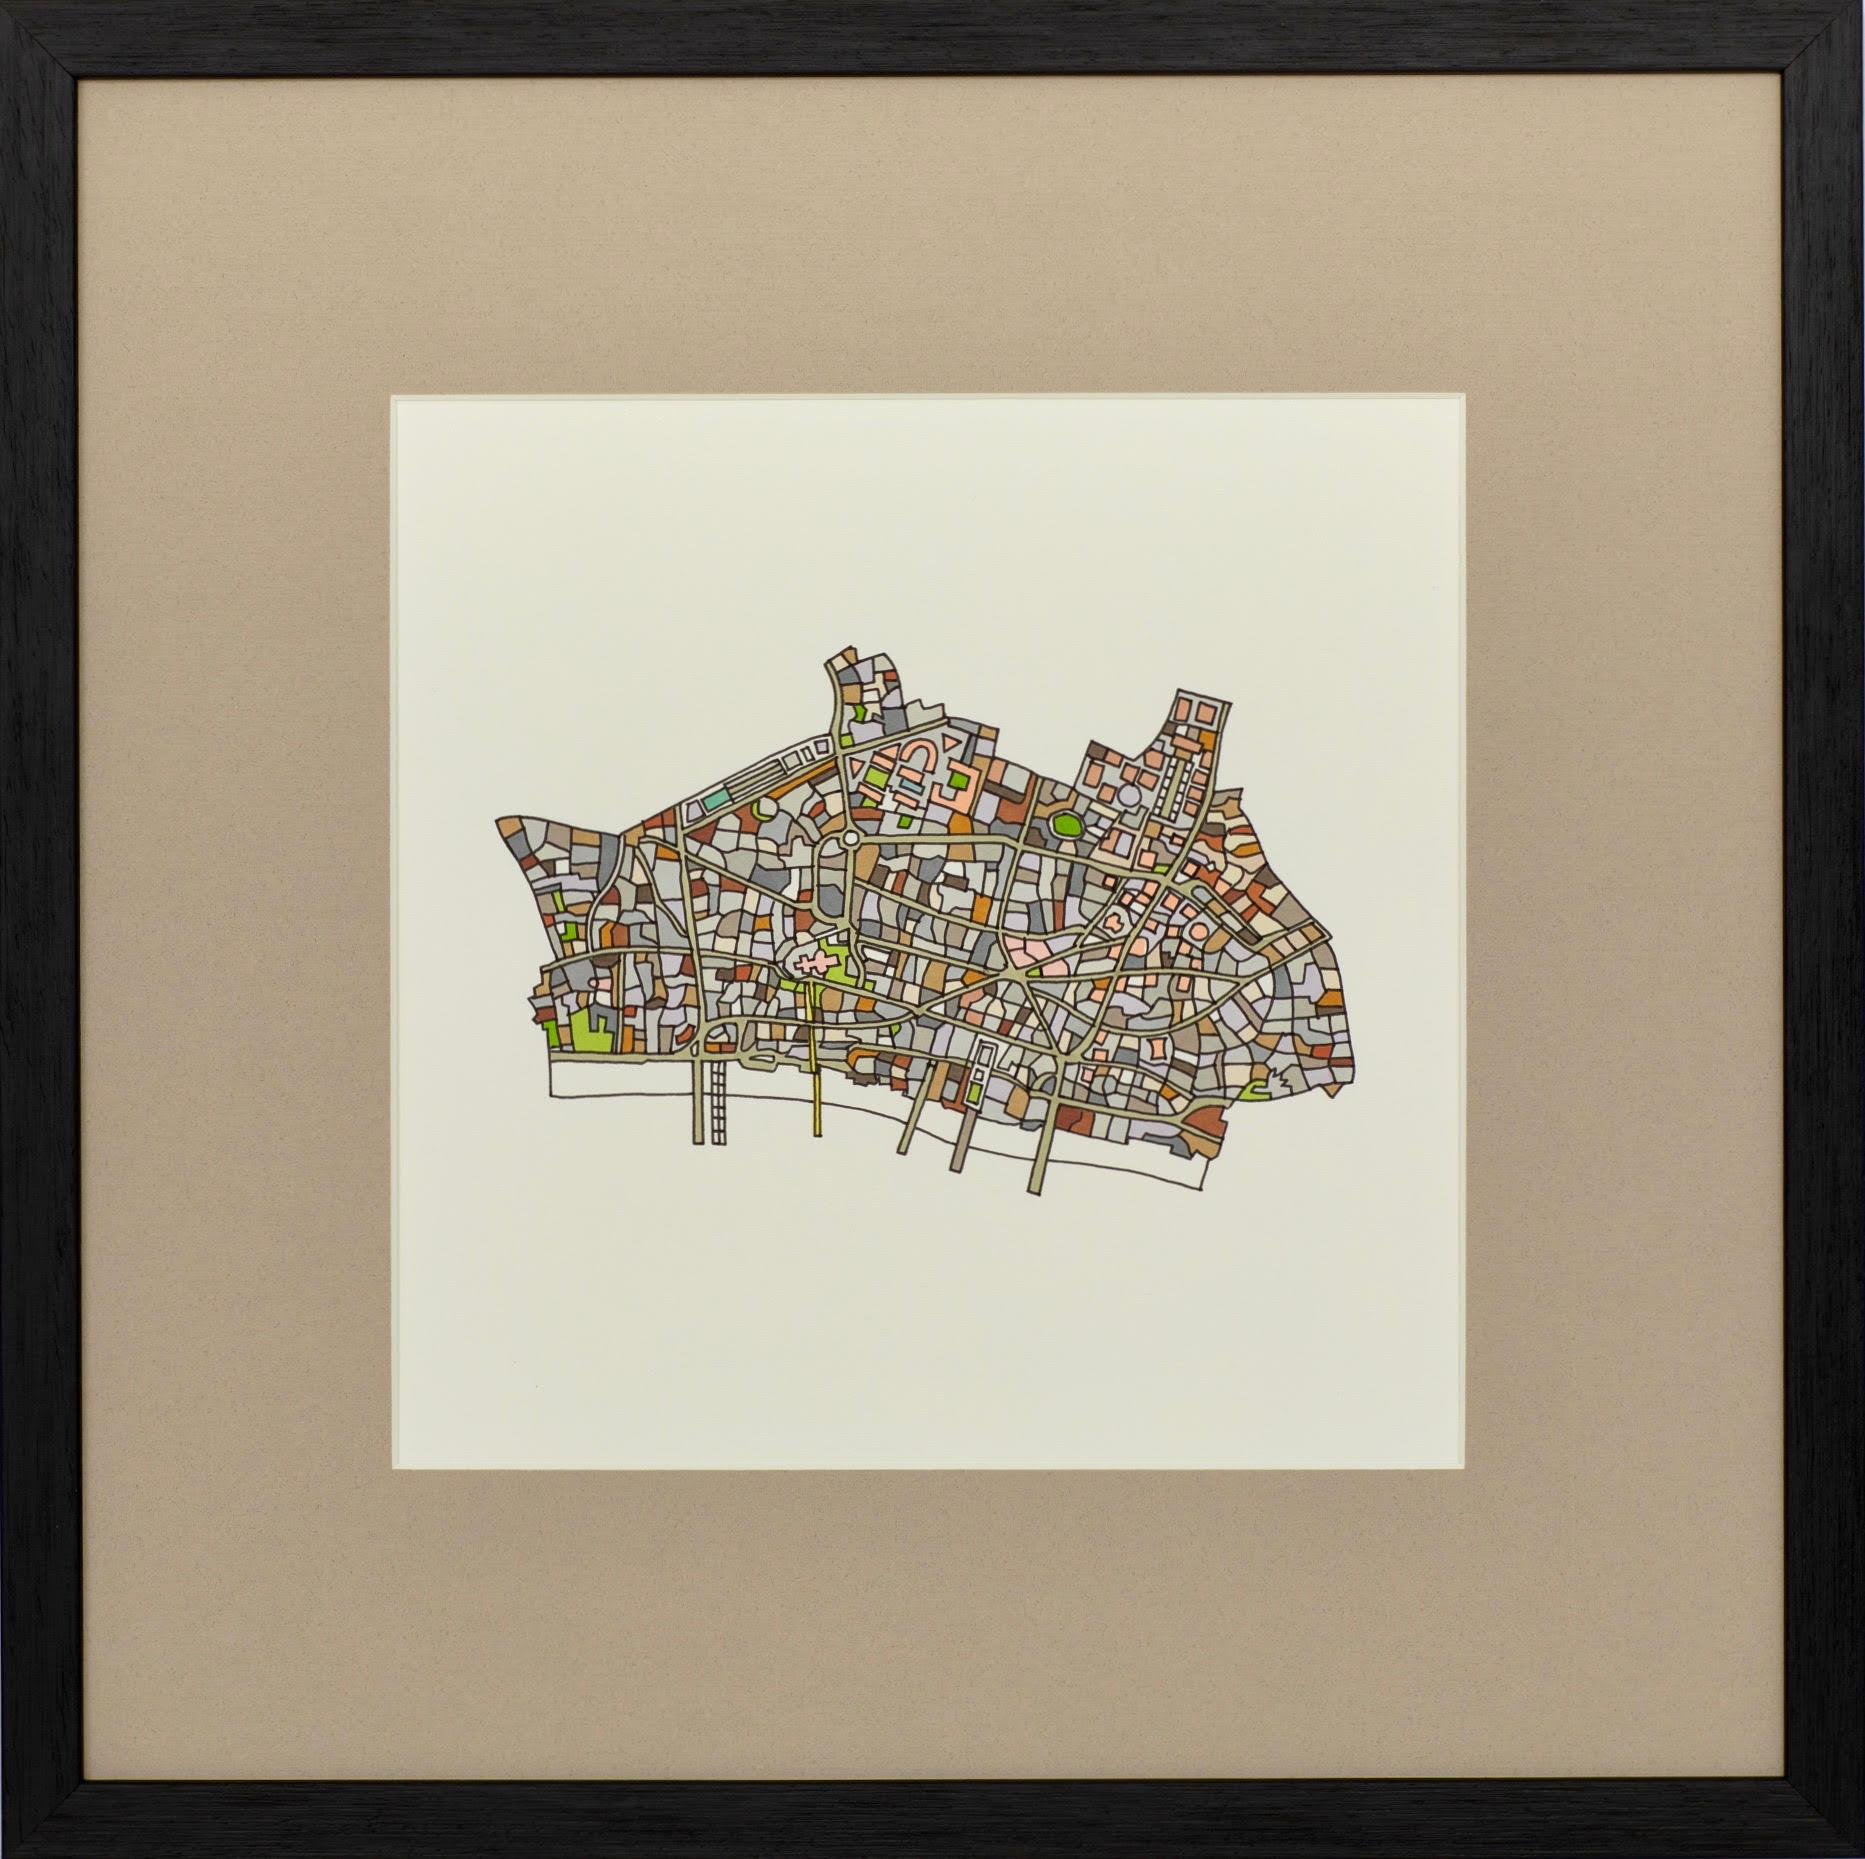 City of London, 2018 | Ink on Paper | 44 x 44 cm | £450 (framed)